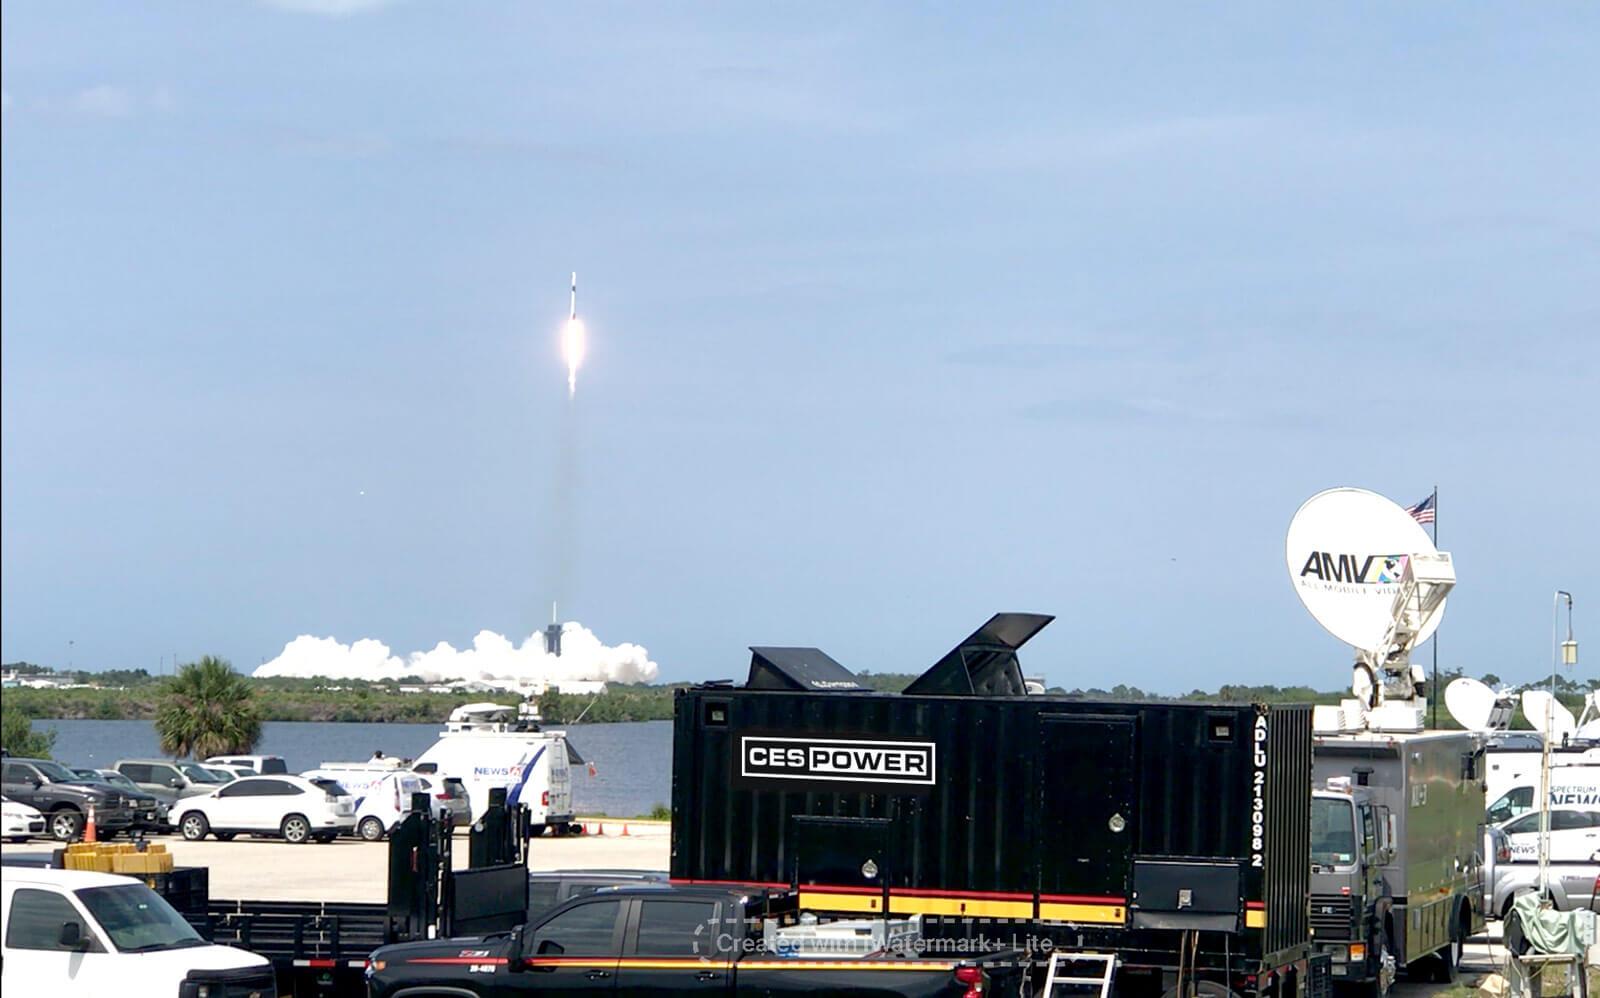 CES Power providing services at a rocket launch.